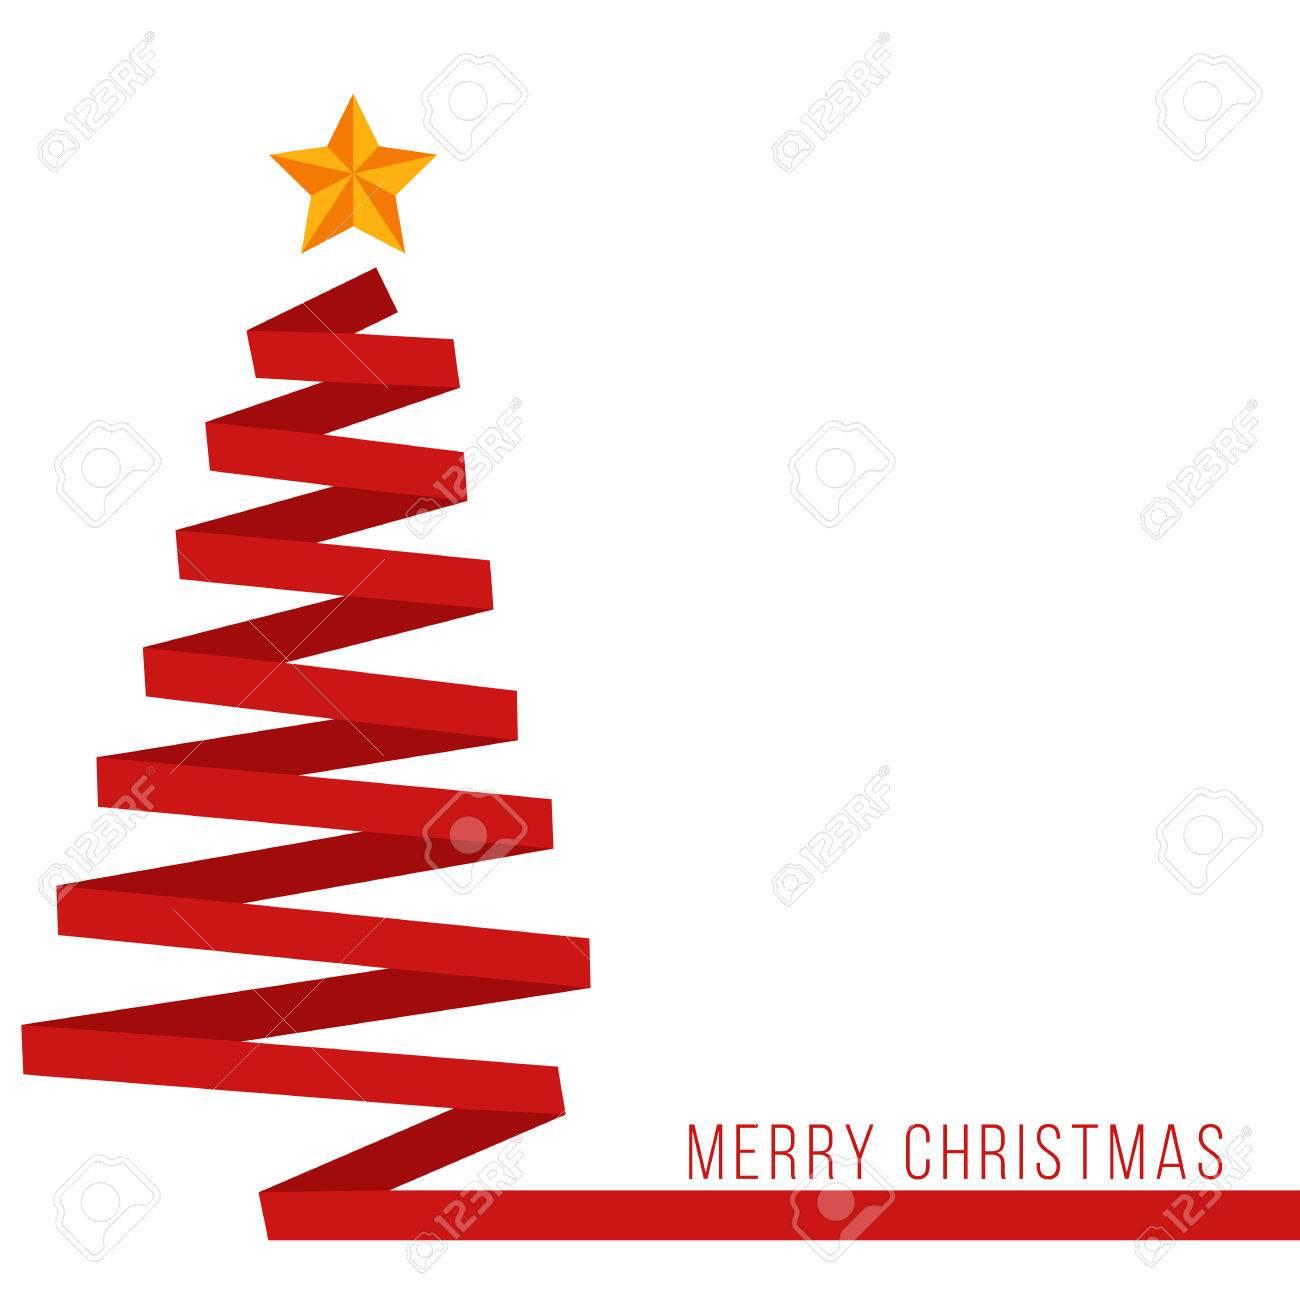 Red ribbon Christmas tree banner - 50035086